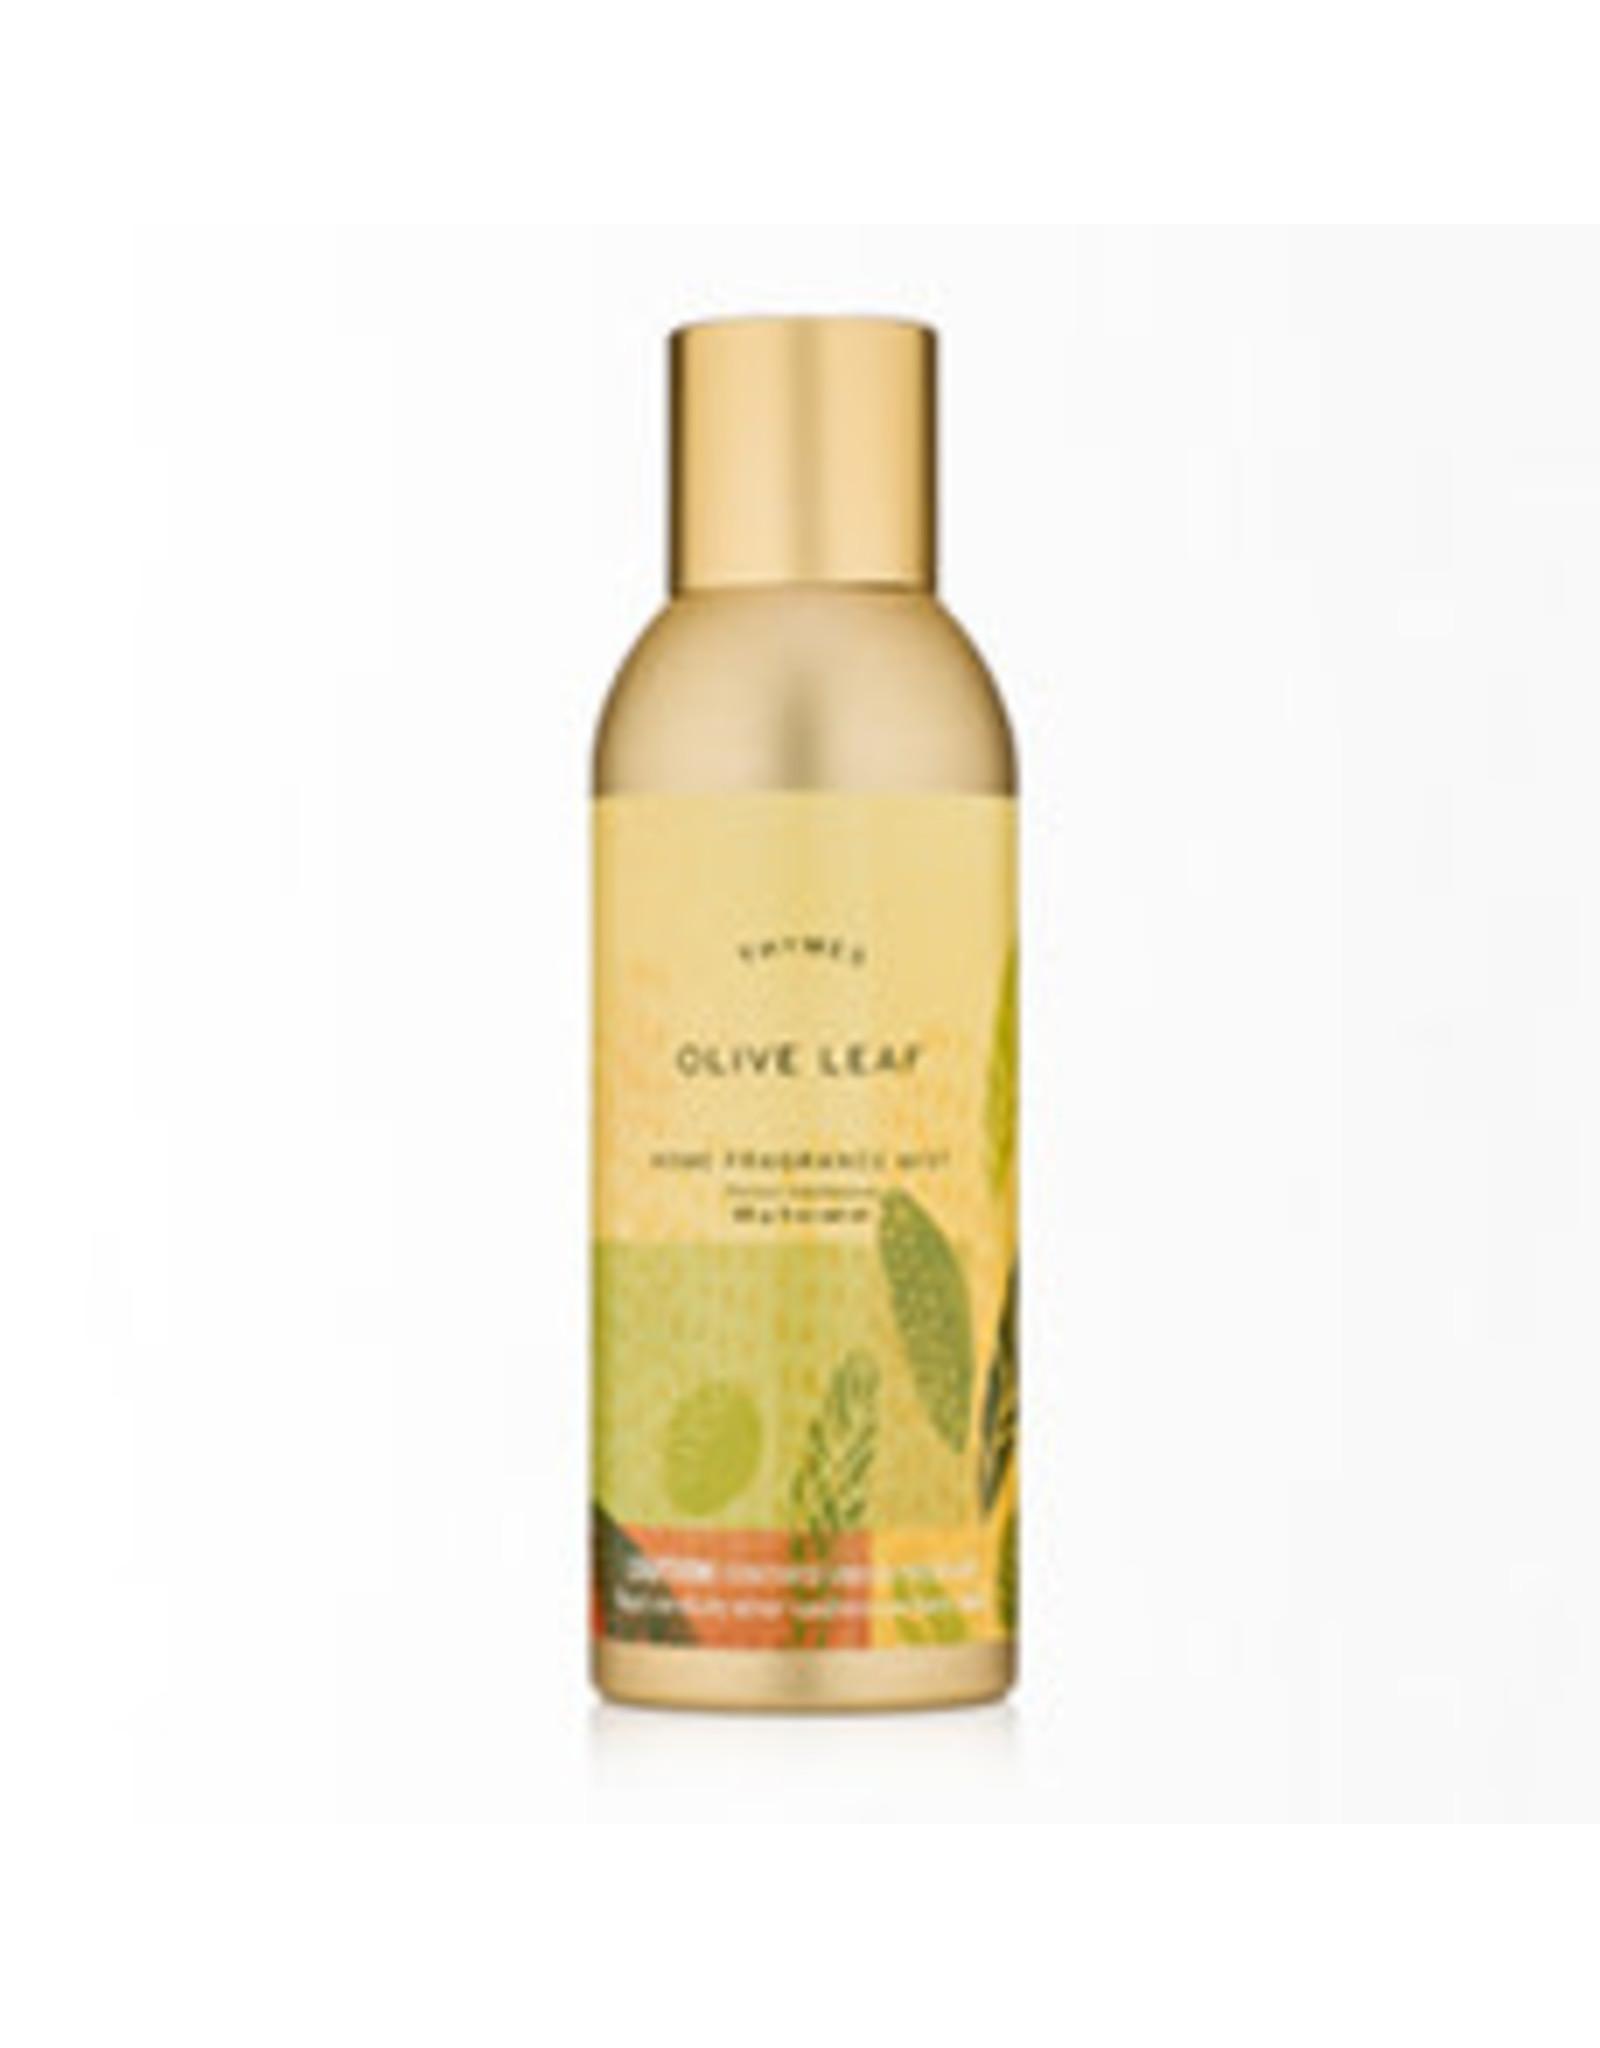 Thymes Olive Leaf Home Fragrance